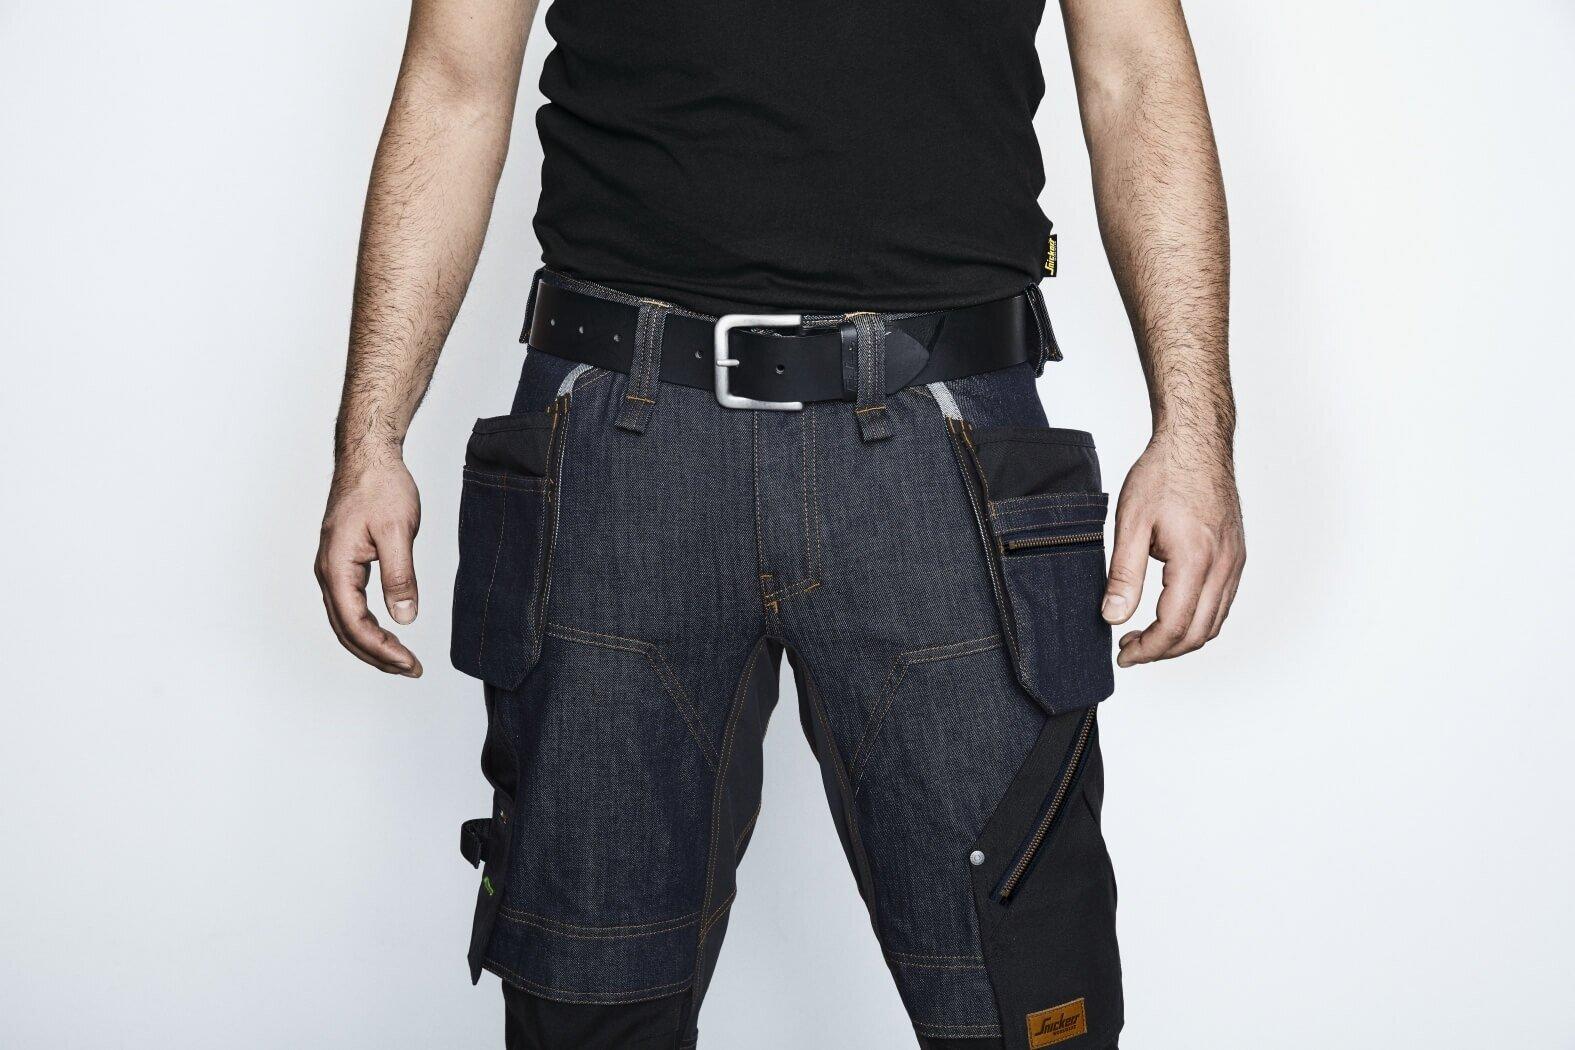 Spodnie i Nakolanniki Snickers